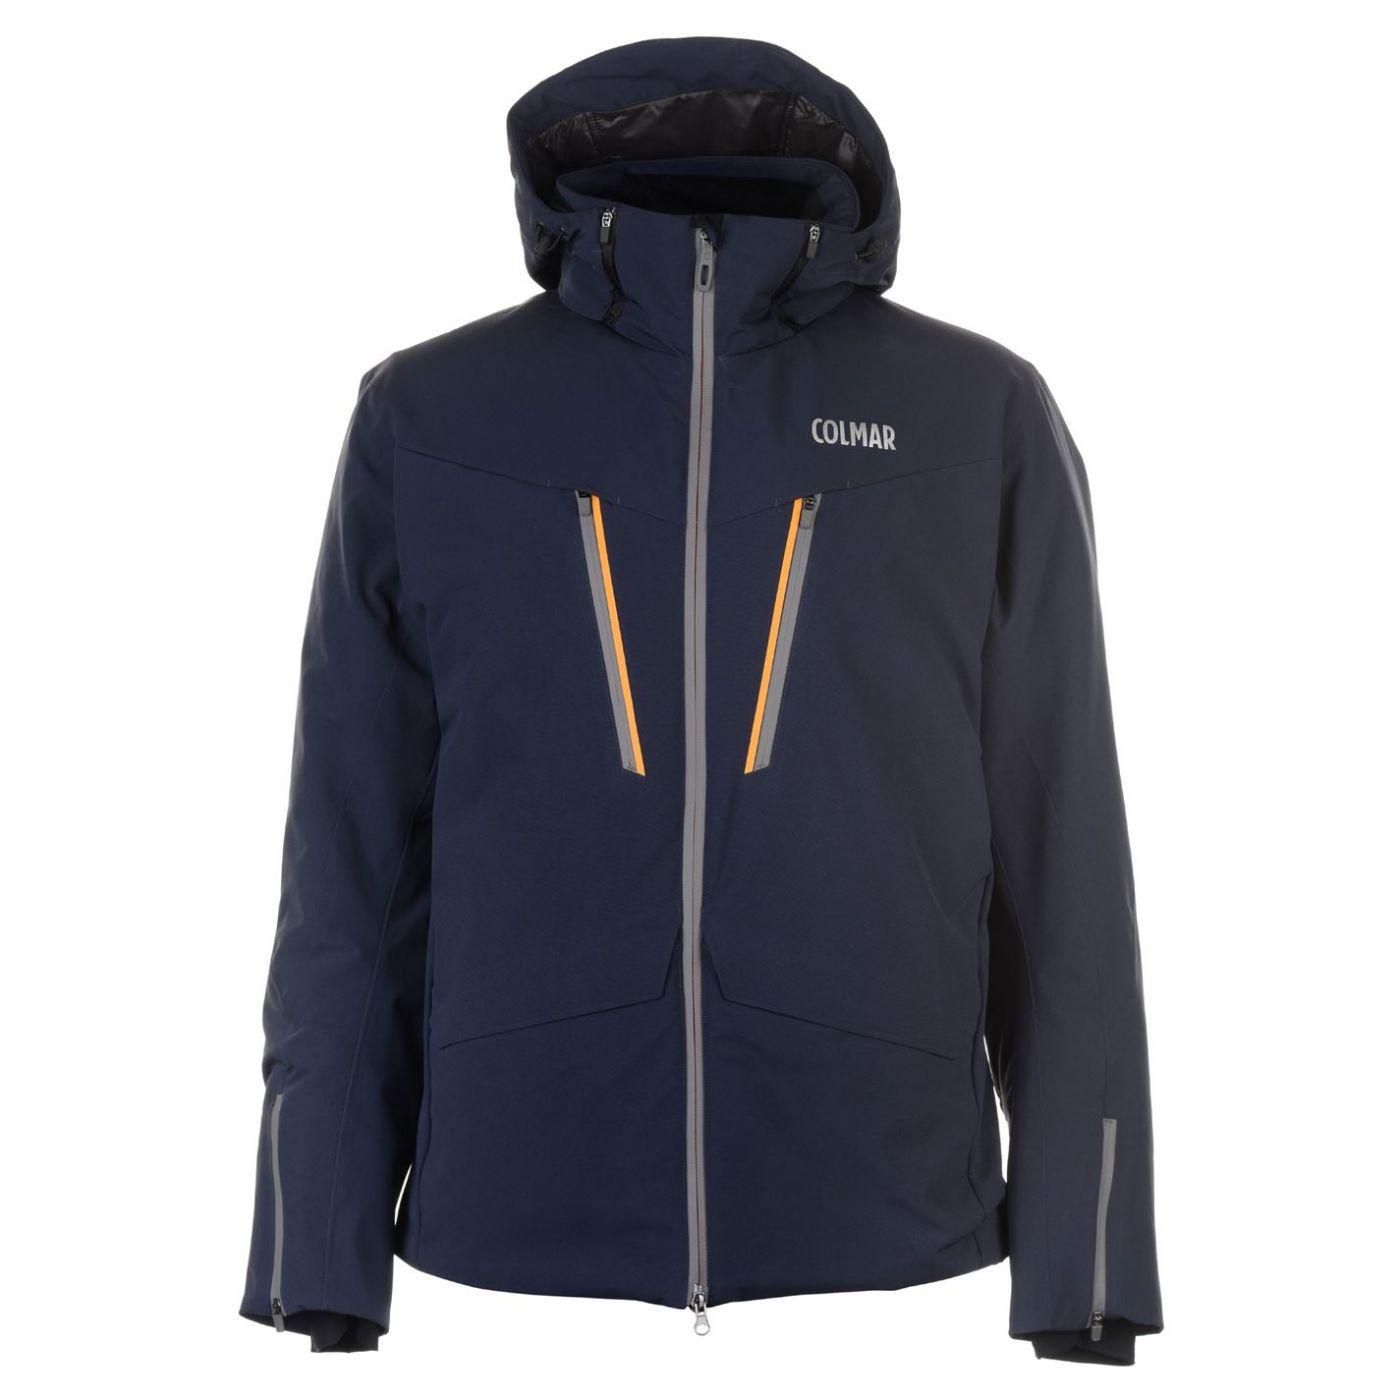 Colmar 1348 Ski Jacket Mens